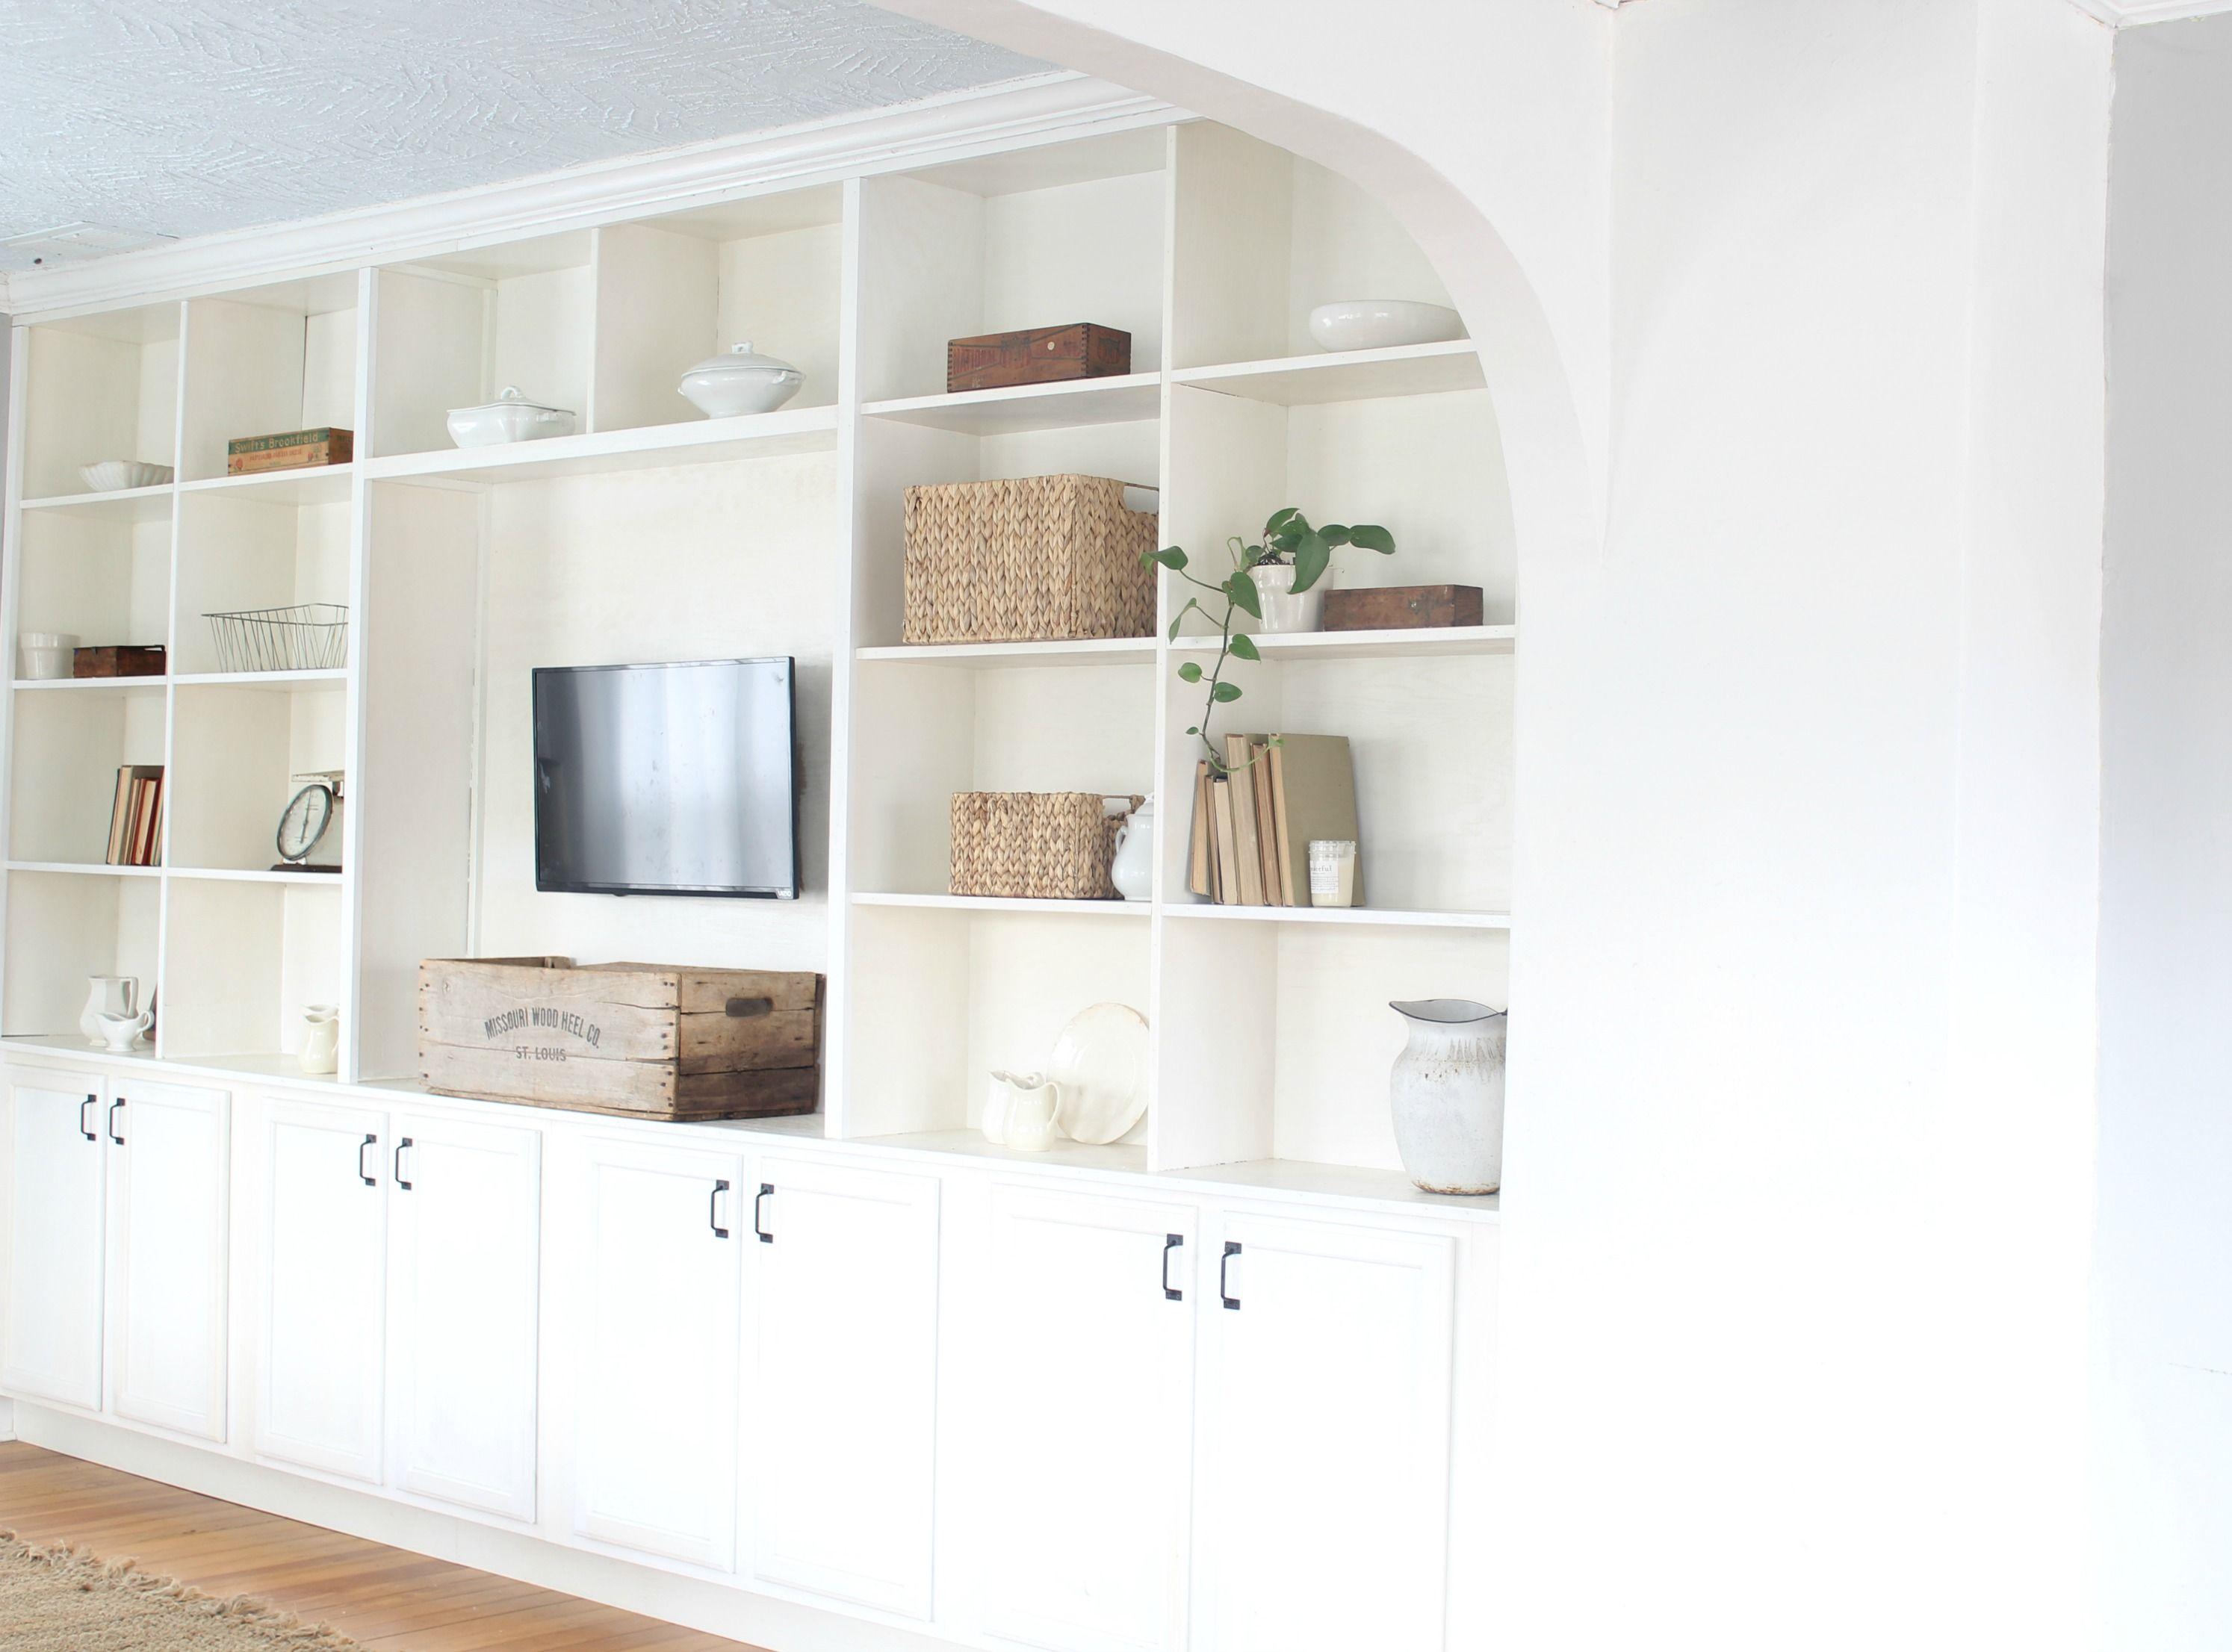 Farmhouse Living Room Built Ins  Living Room Built Ins Built Ins Impressive Living Room Built Ins 2018